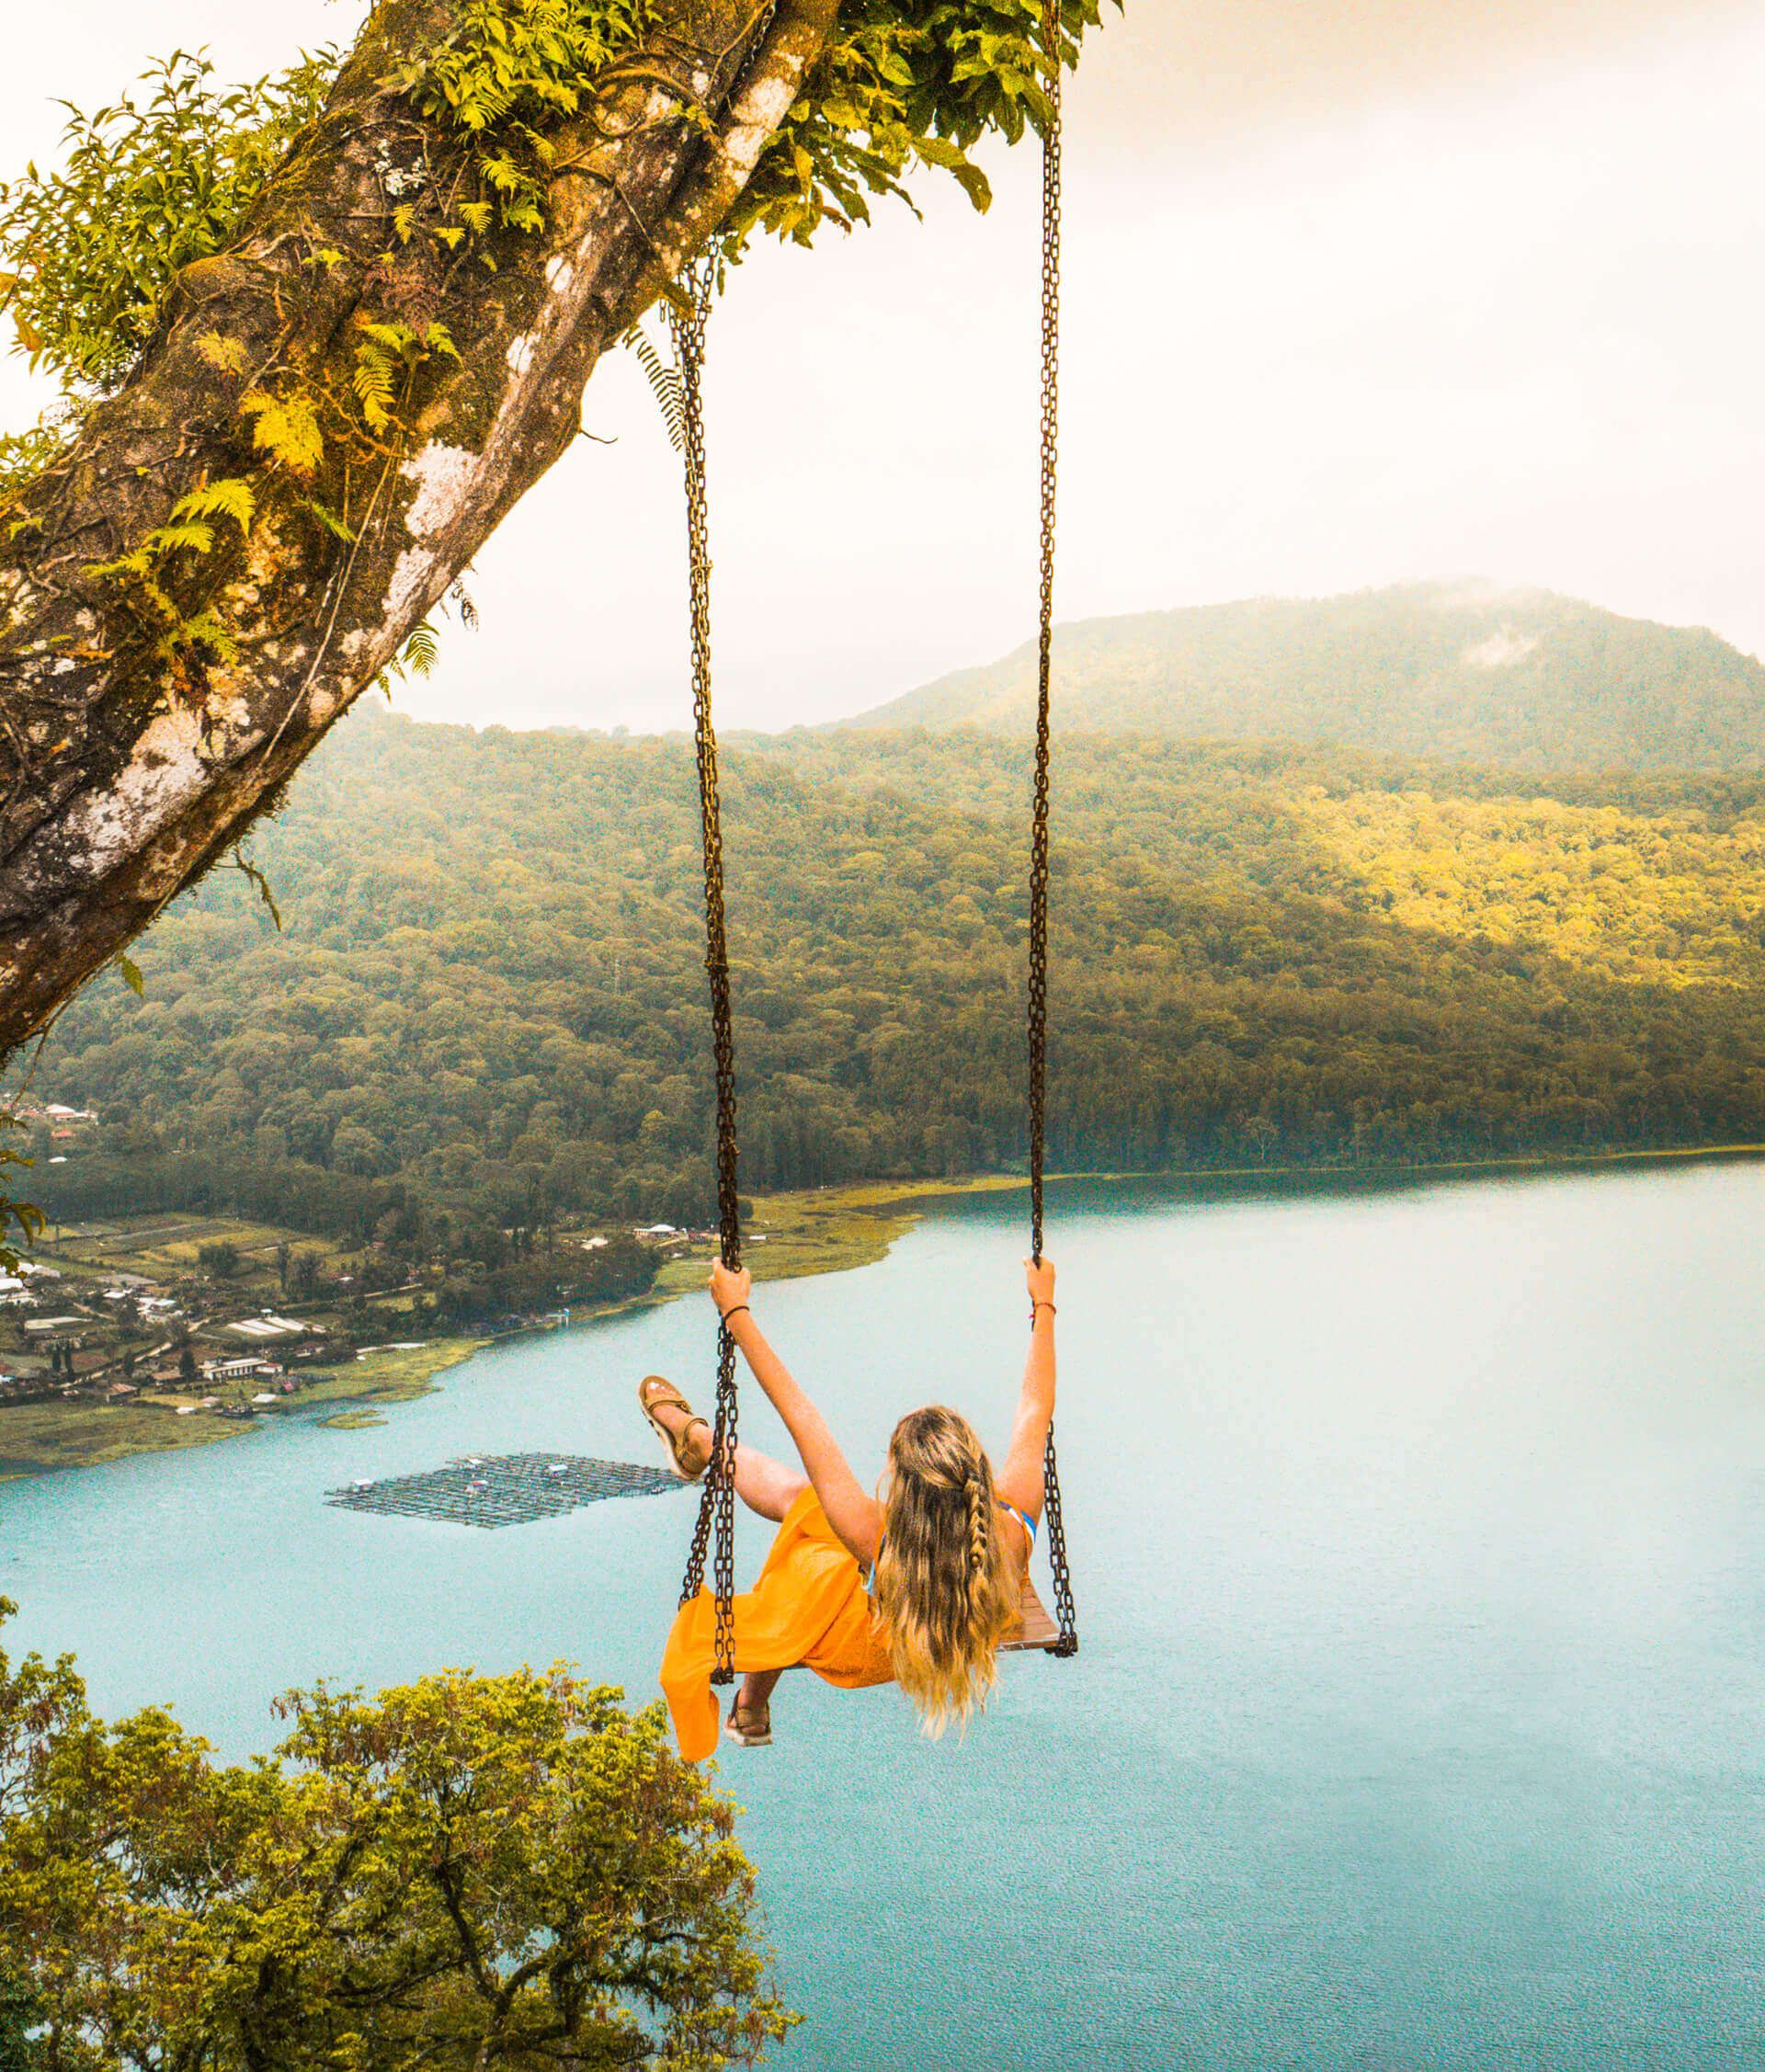 munduk things to do swing viewpoint wanagiri swing Bali